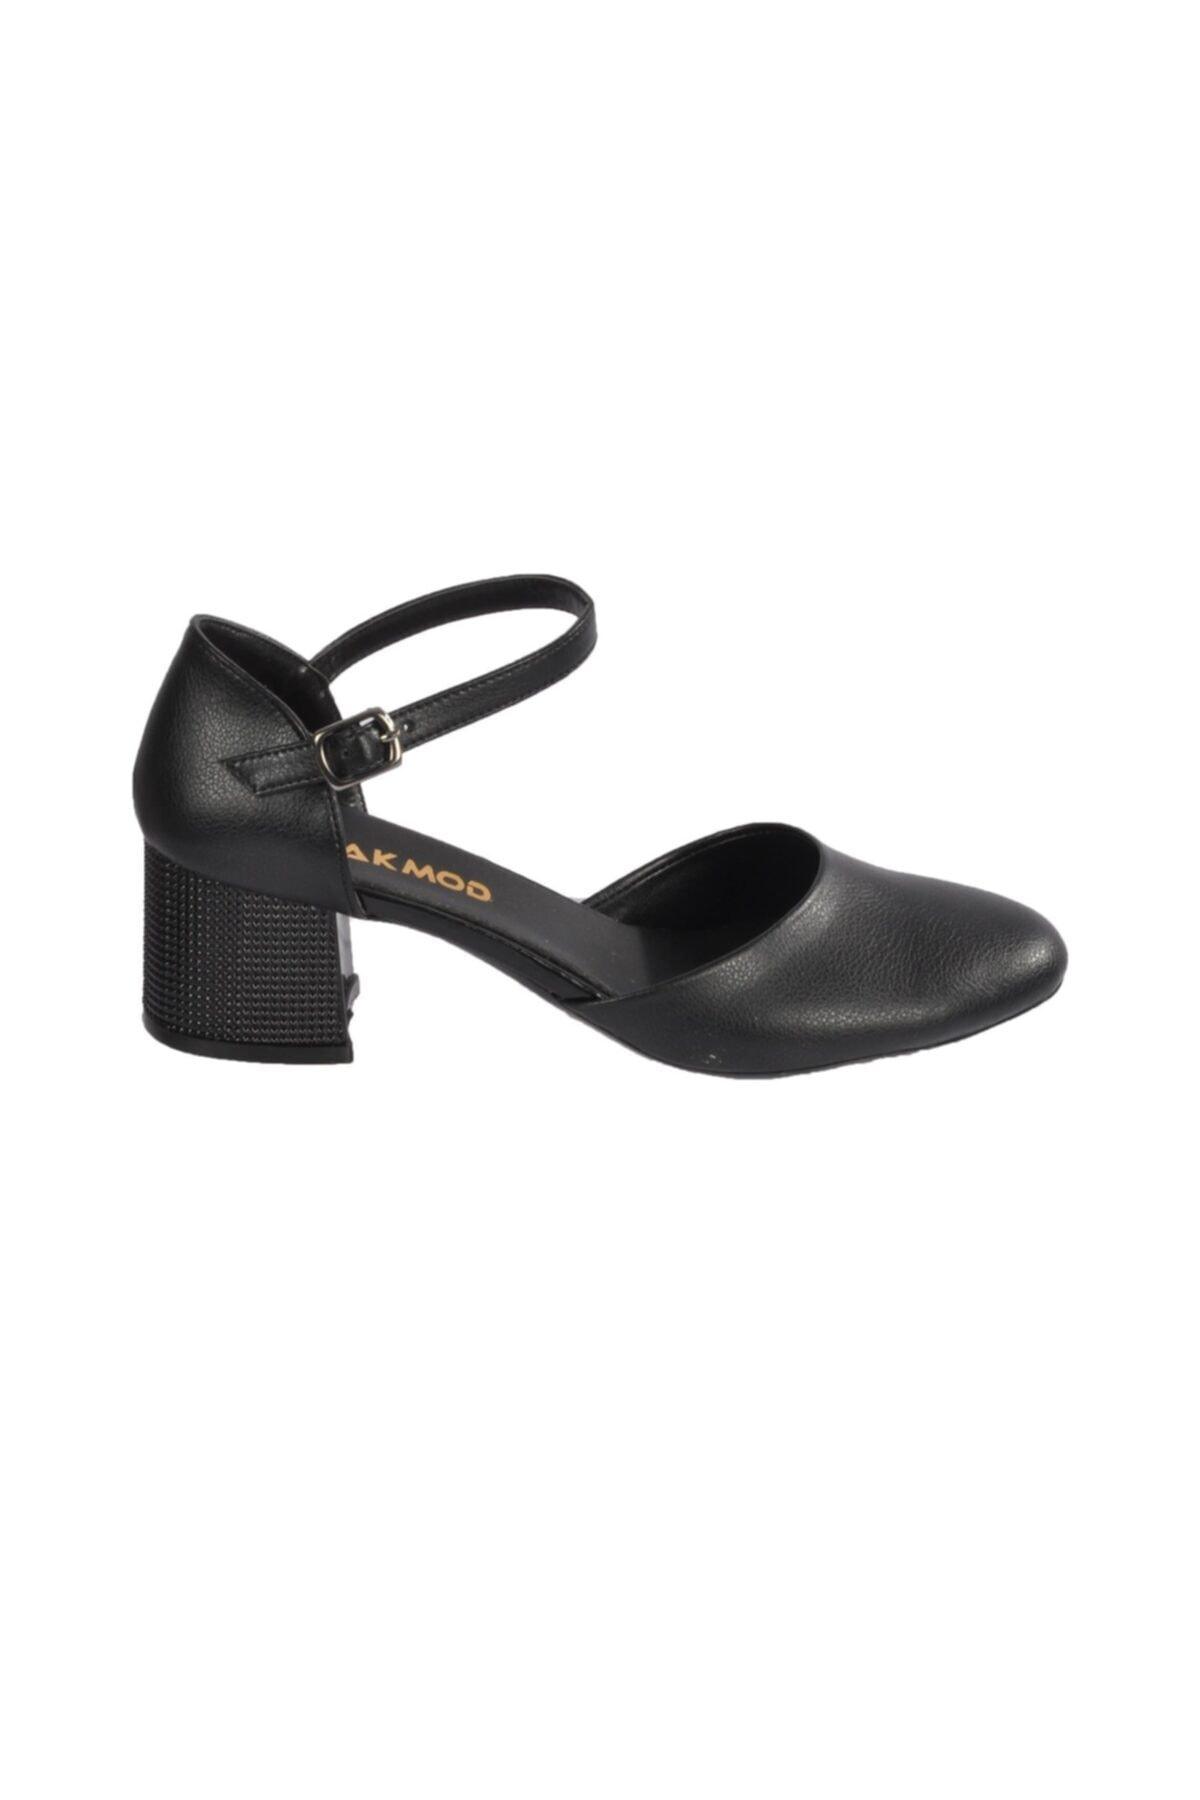 Maje 6031 Siyah Kadın Topuklu Ayakkabı 2